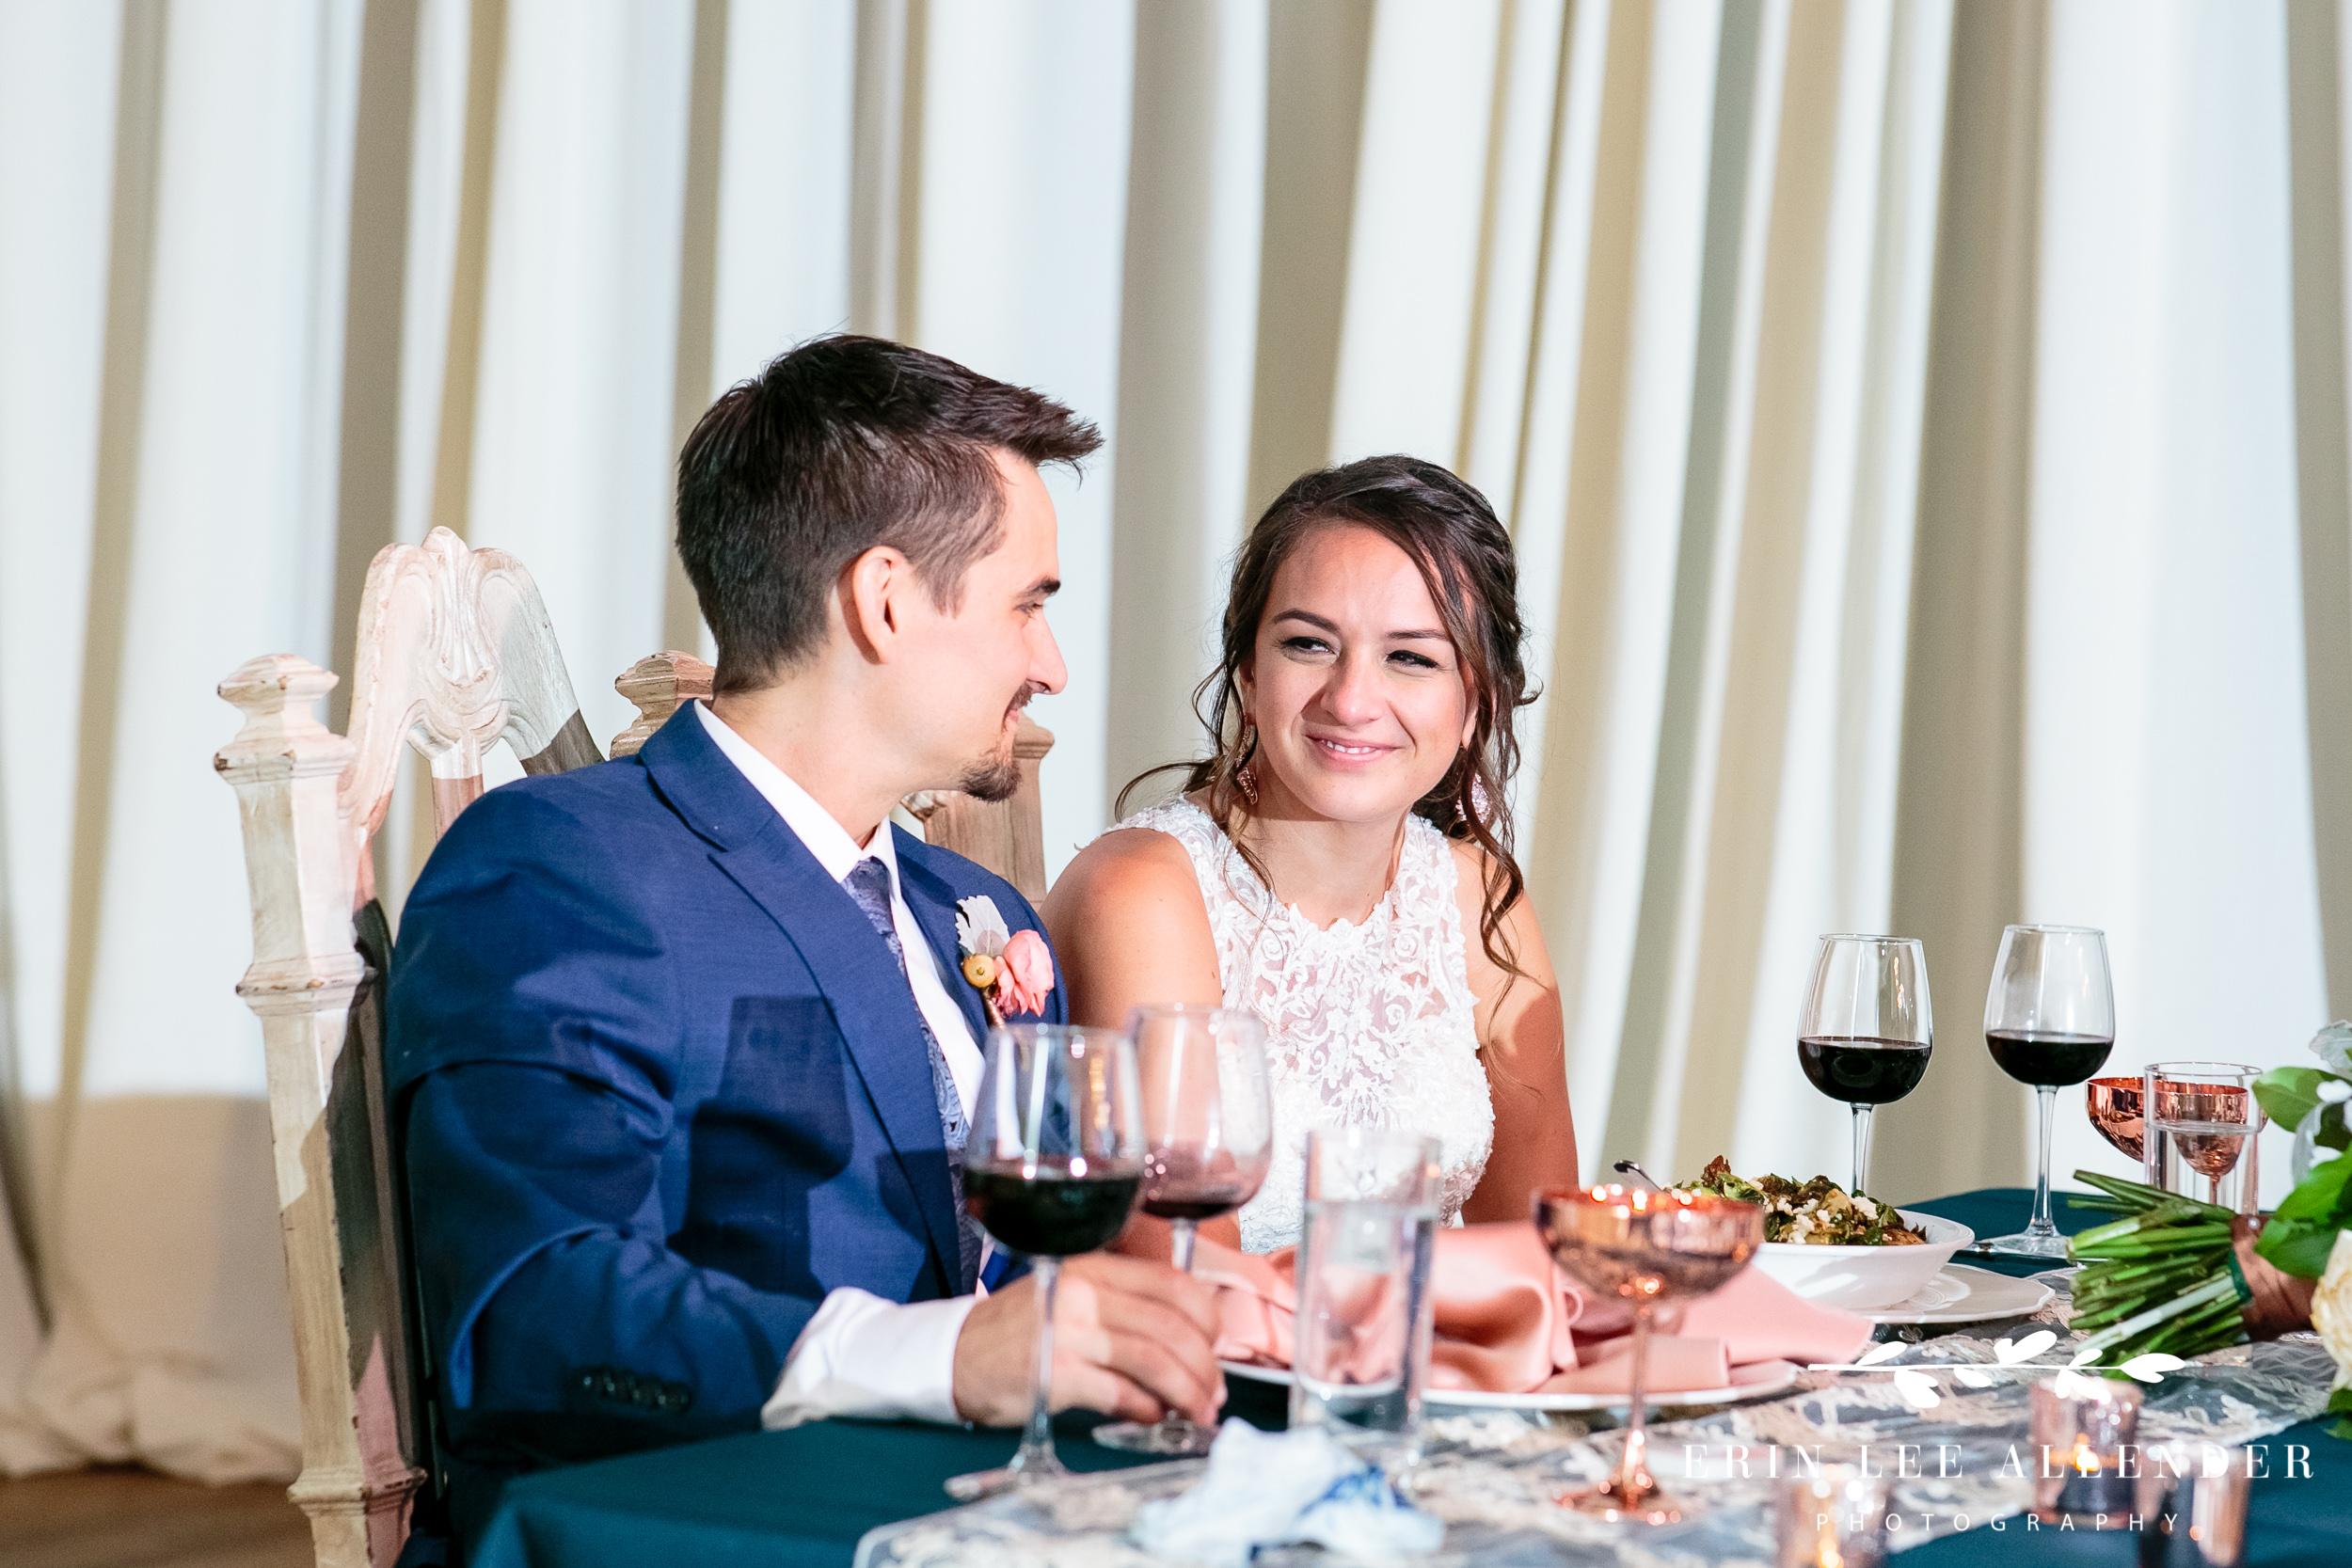 wedding-toast-photograph